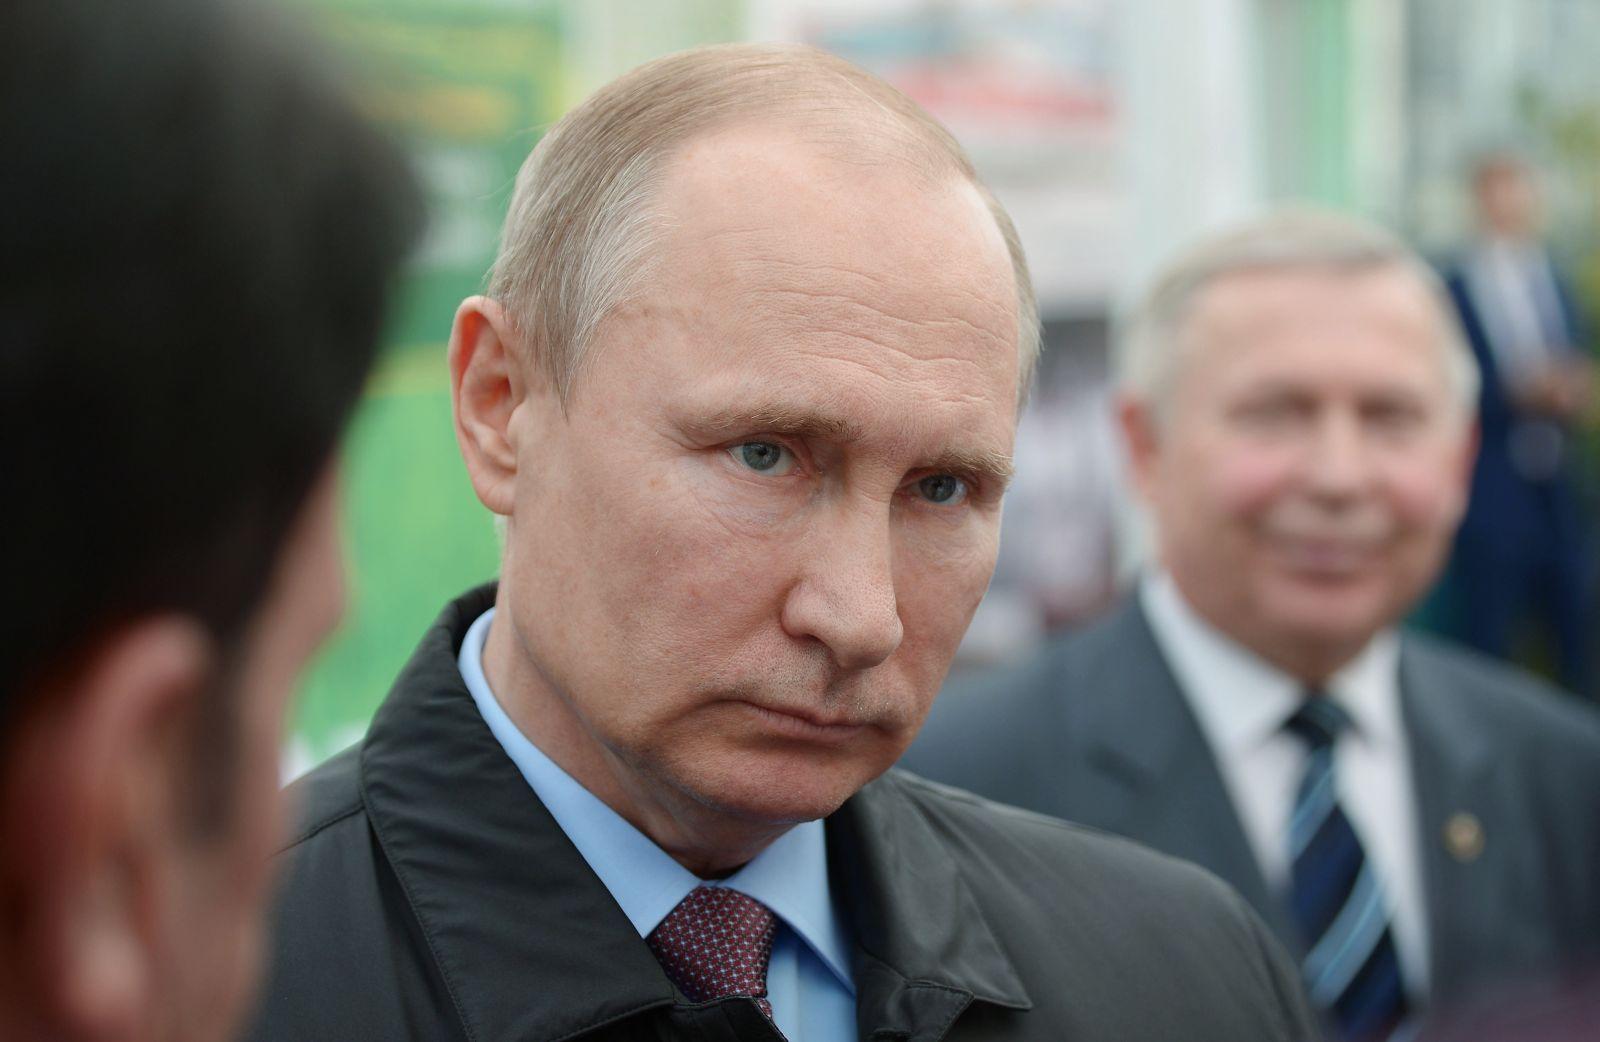 Russian President Vladimir Putin listens to employees of the Lukyanenko National Grain Center in Krasnodar, Russia, Monday, March 12, 2018. (Alexei Nikolsky, Sputnik, Kremlin Pool Photo via AP)